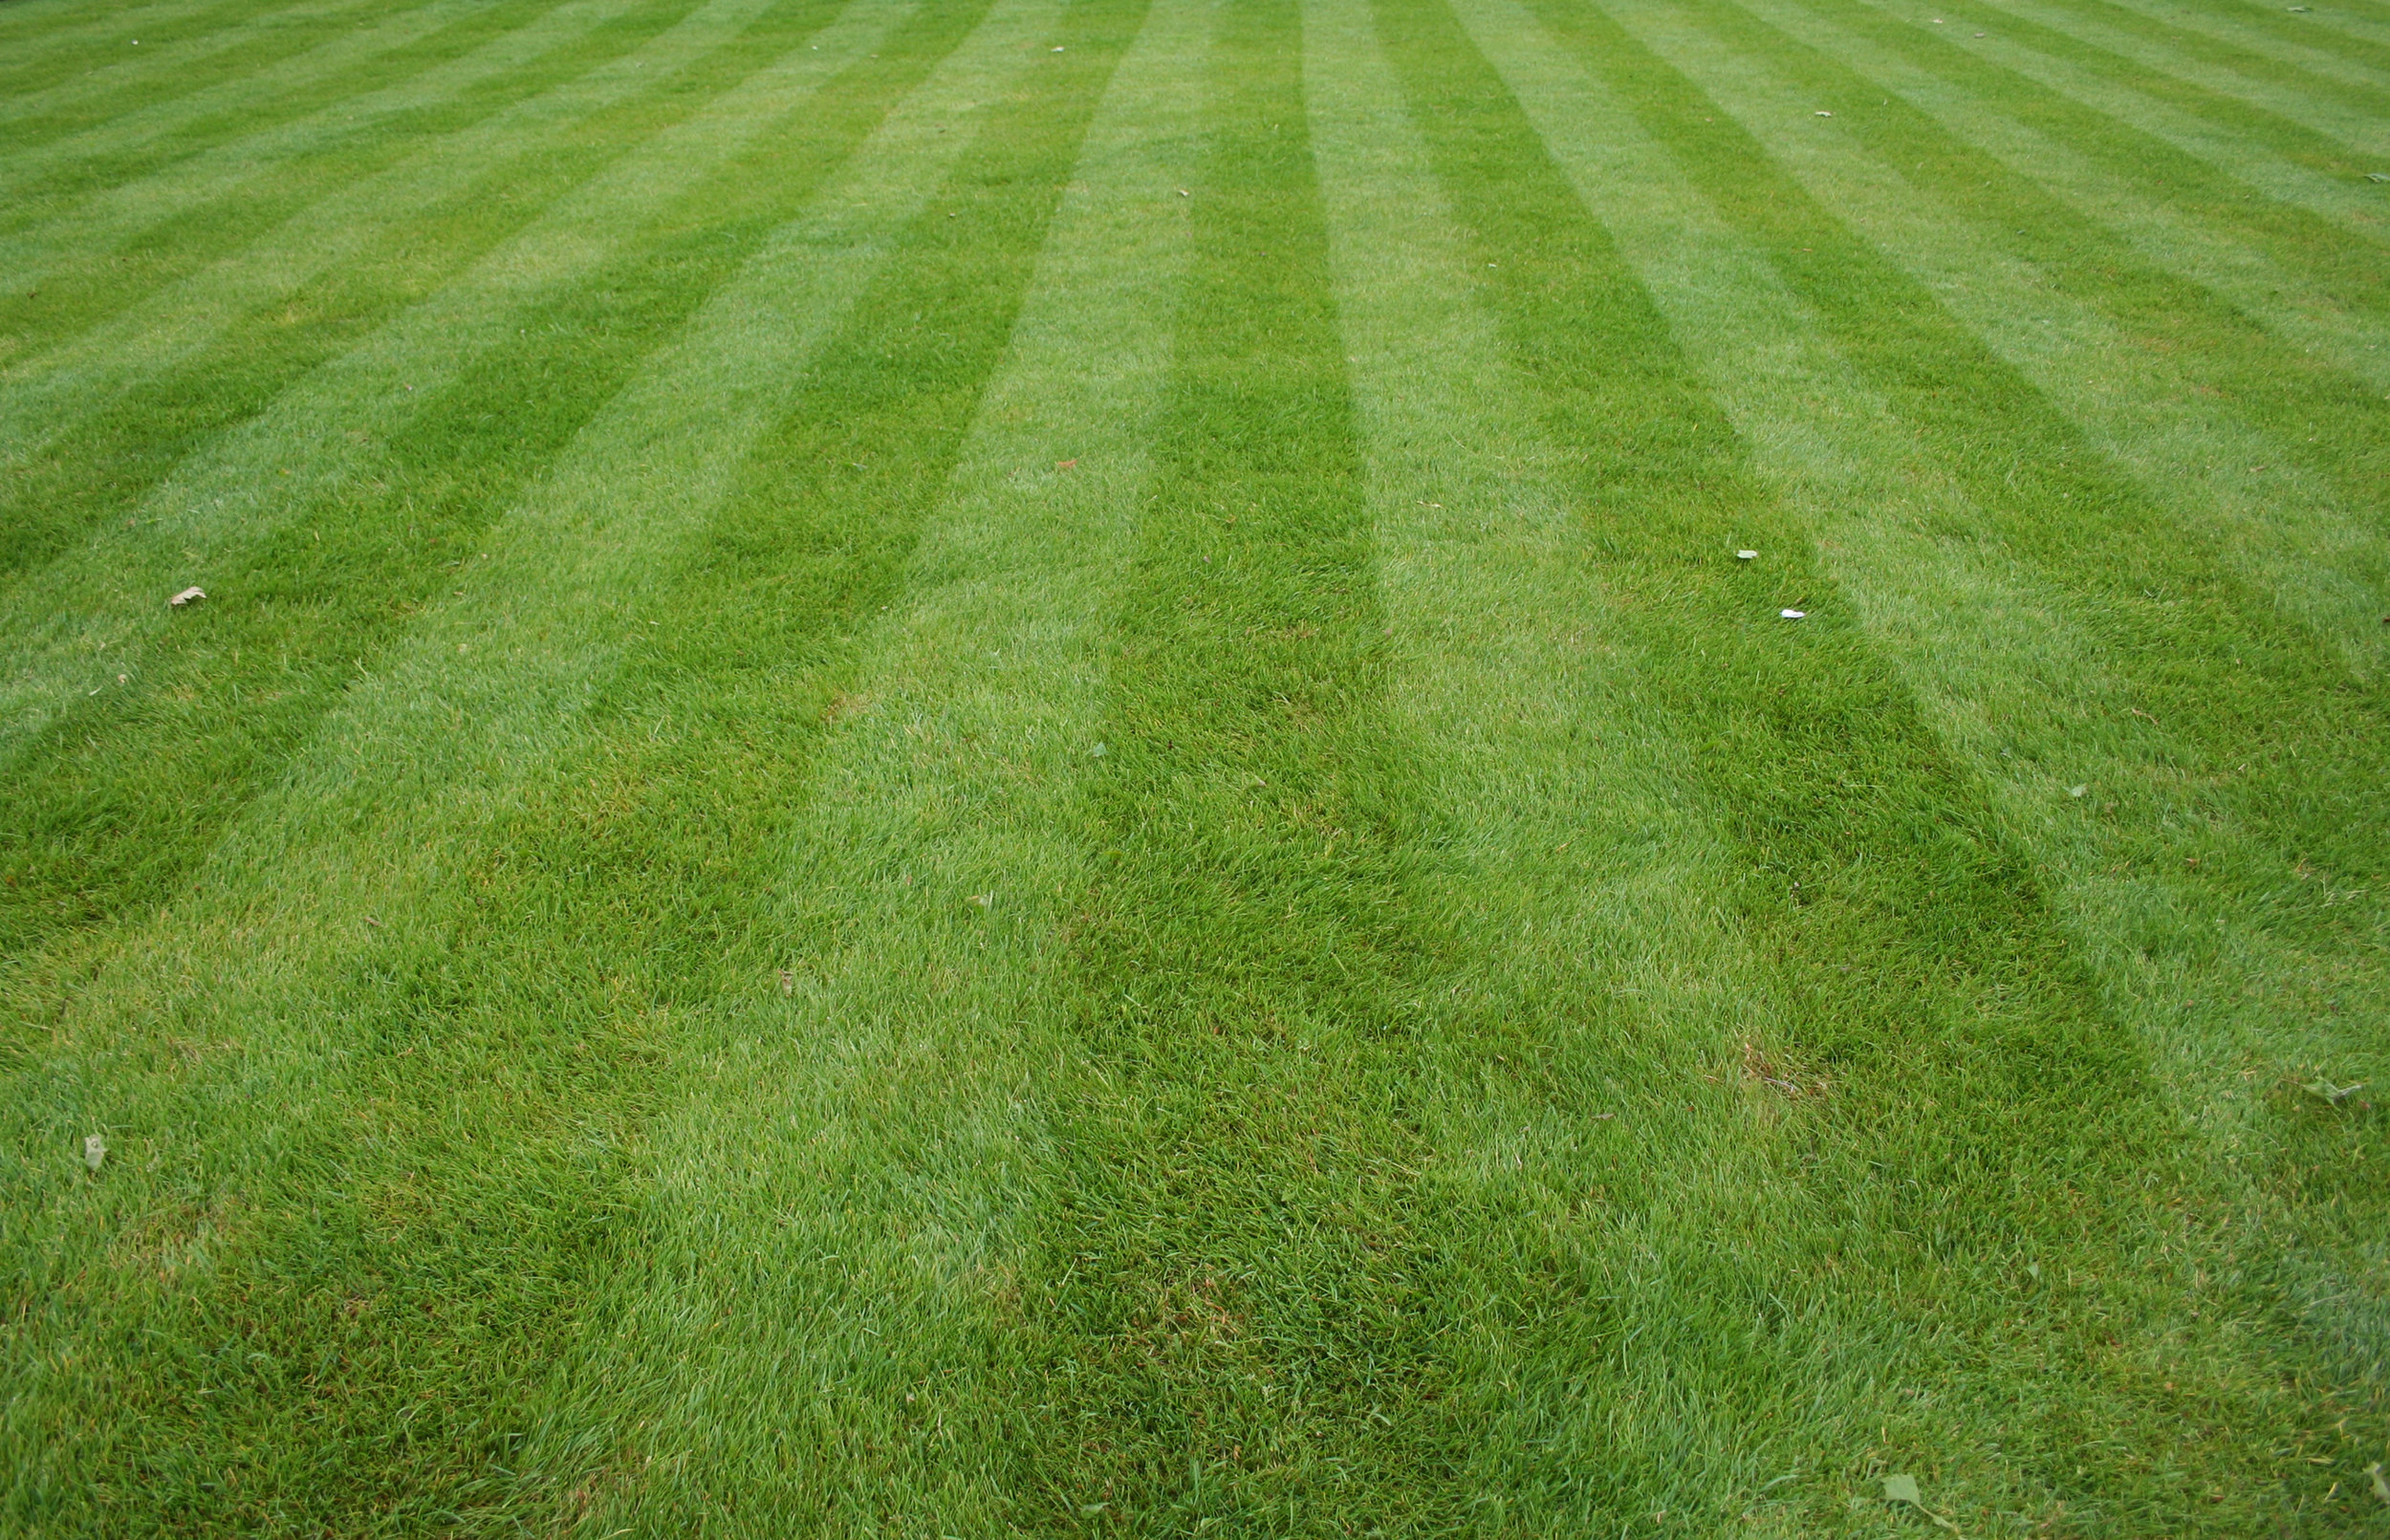 Traditional-Lawn-Fertilizer-Program-Pleasant-View-Nursery-Garden-Center-Worcester-MA.jpg